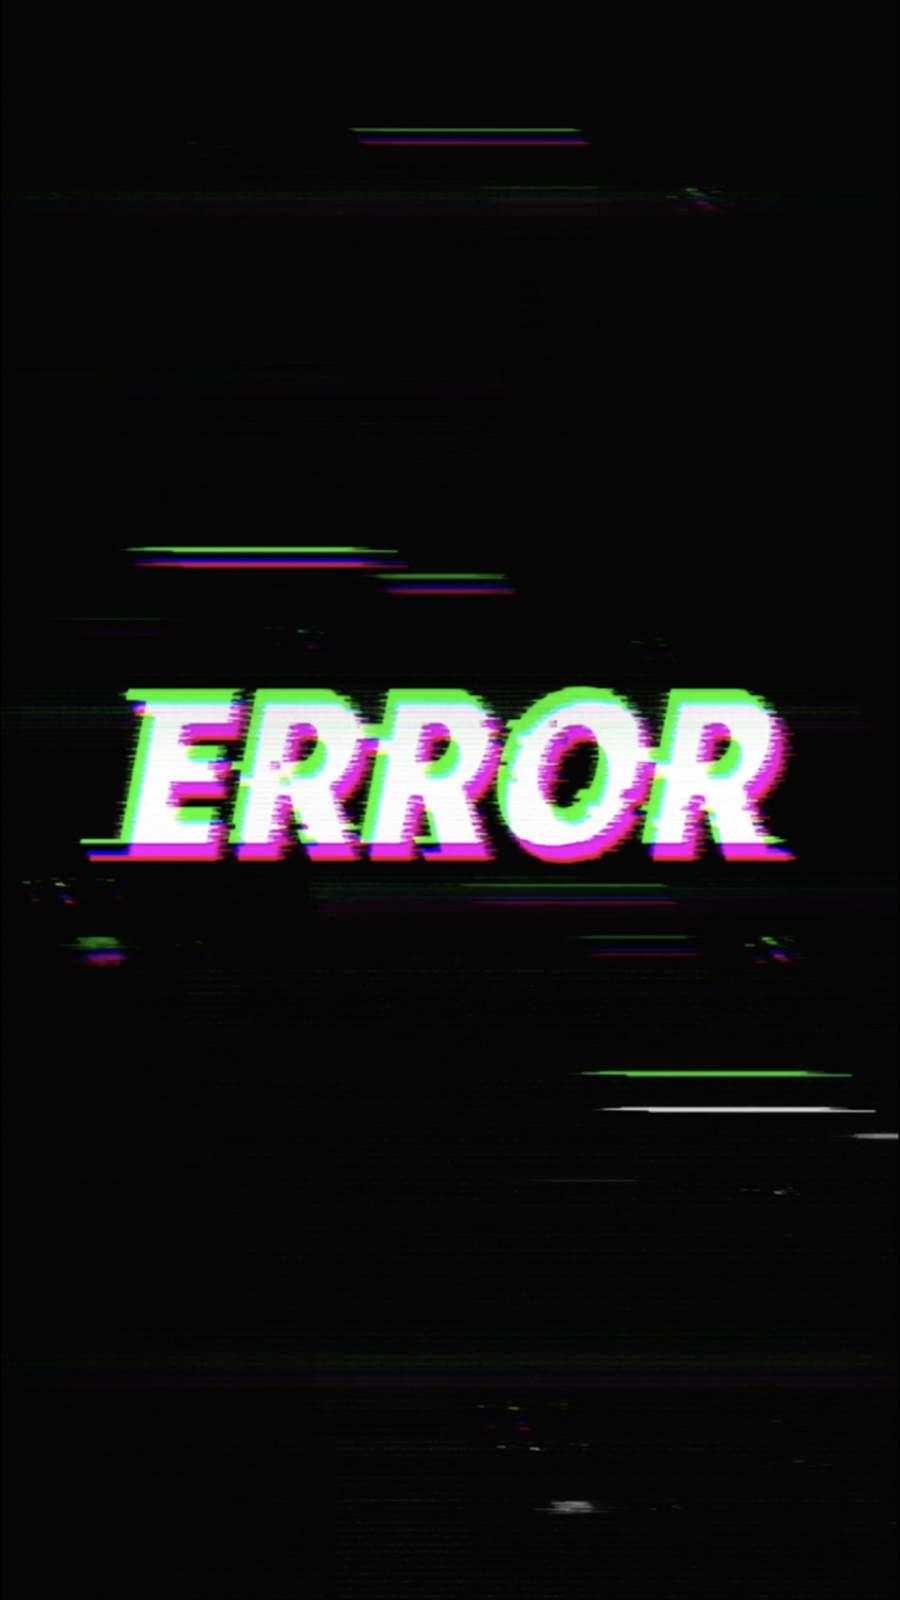 ERROR TEXT iPhone Wallpaper